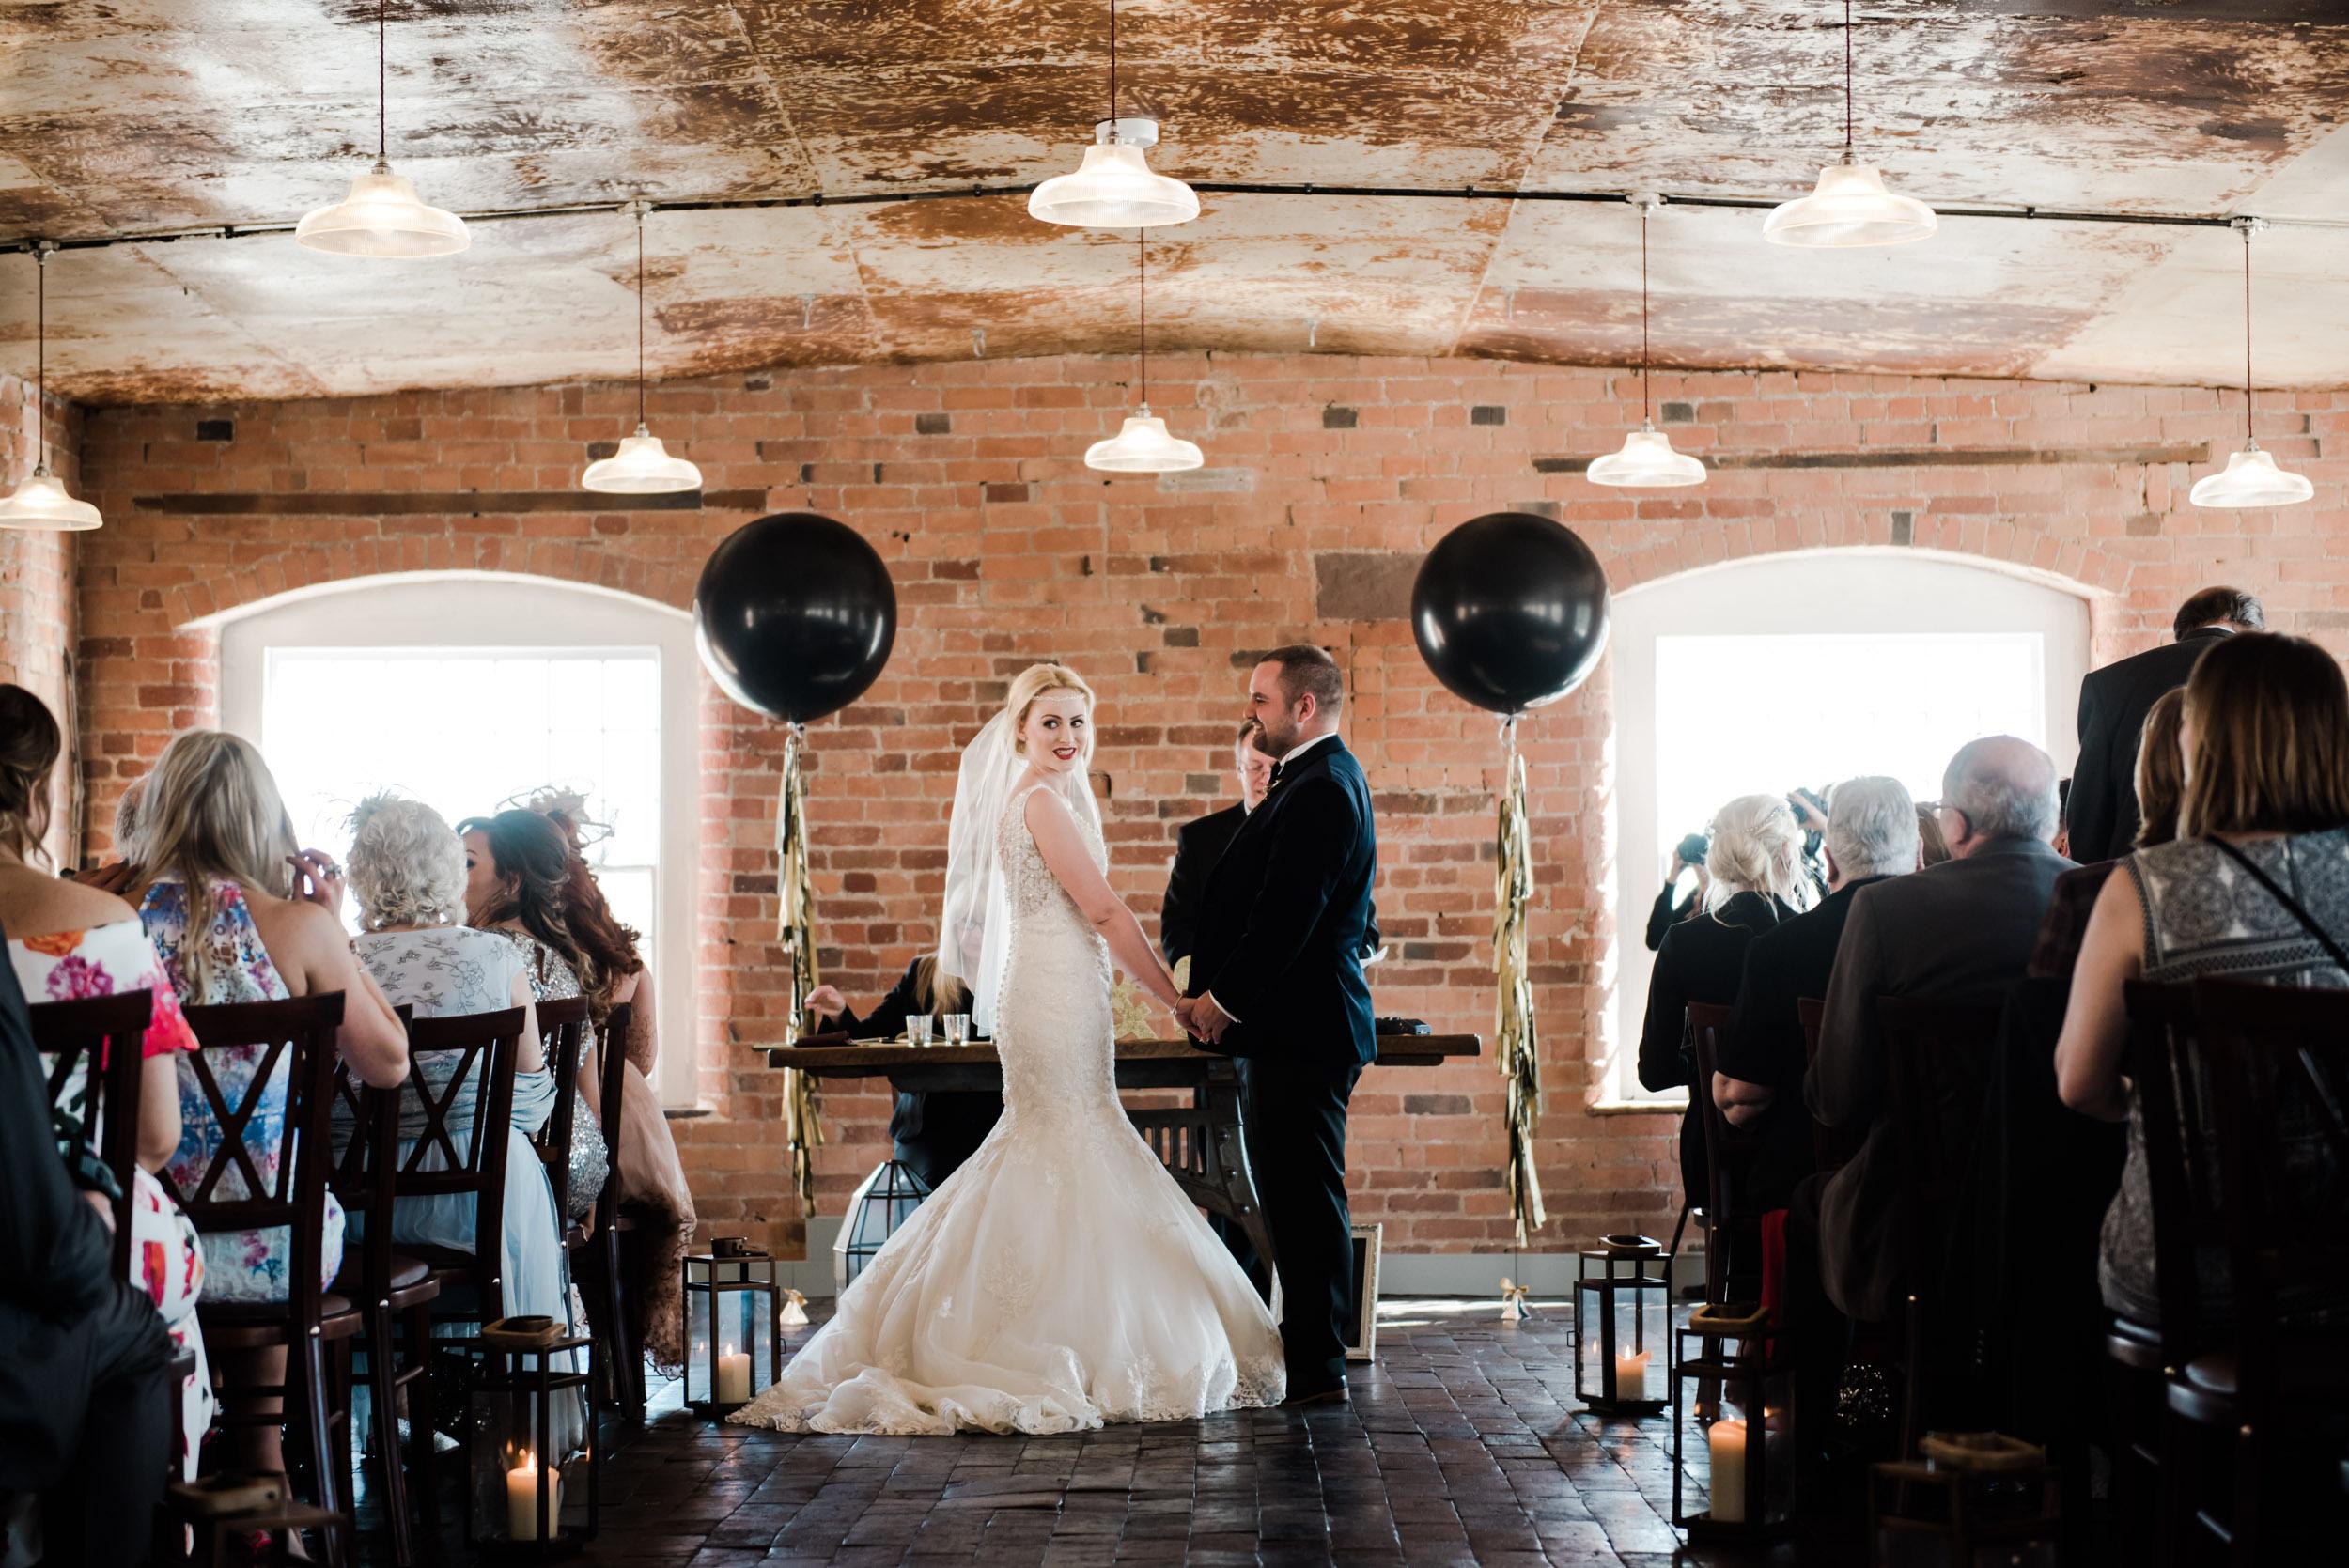 Industrial_glamour_wedding_west_mill_derby78